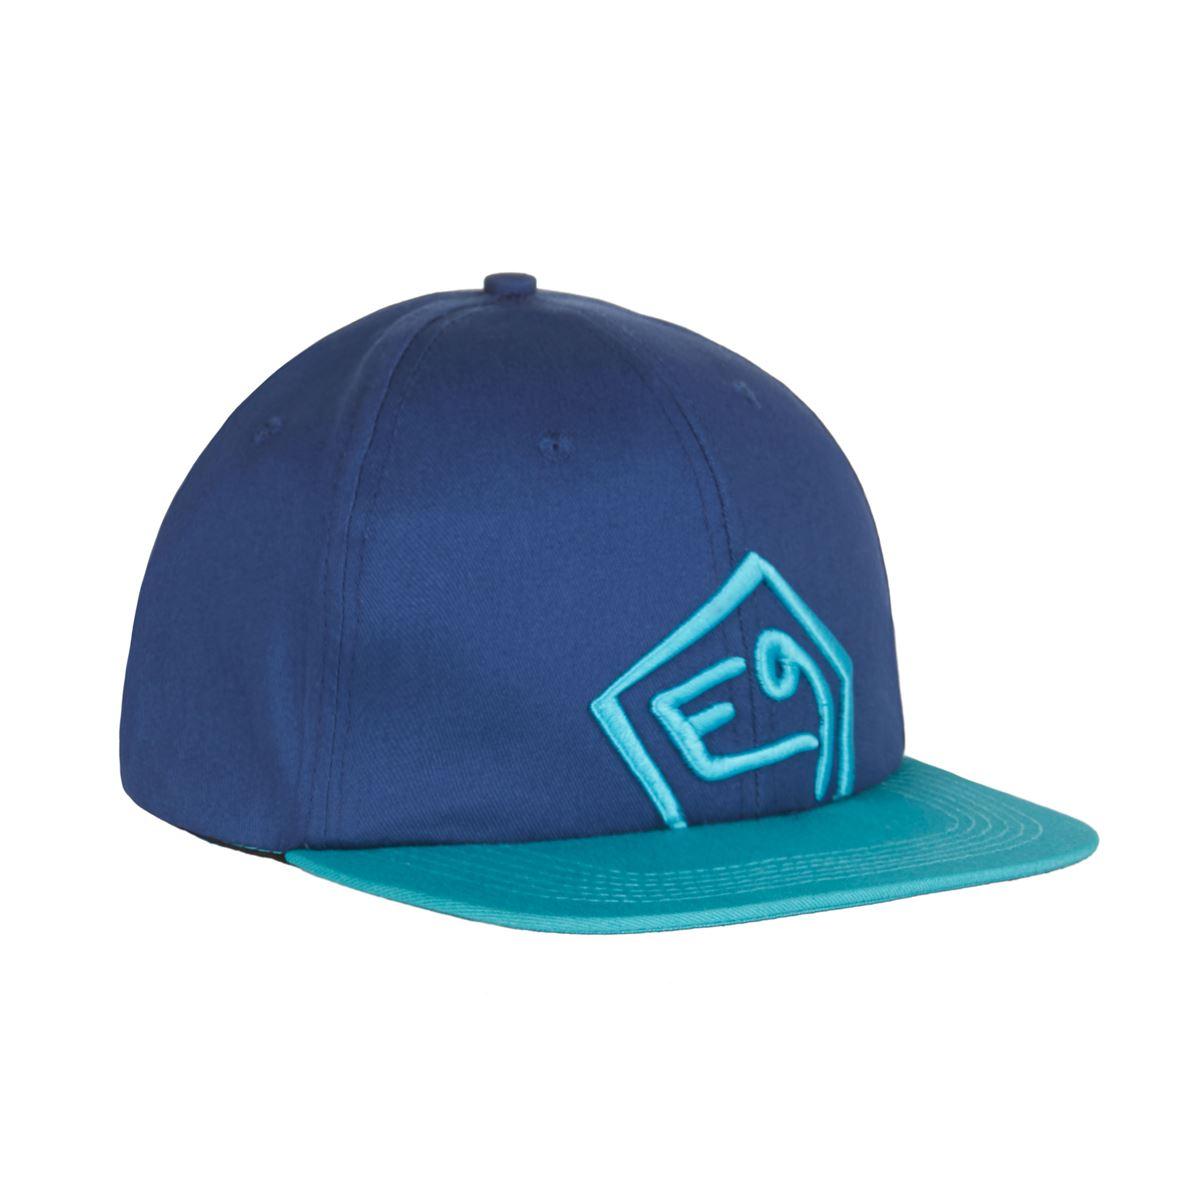 E9 Joe Cap Needle Sports Ltd